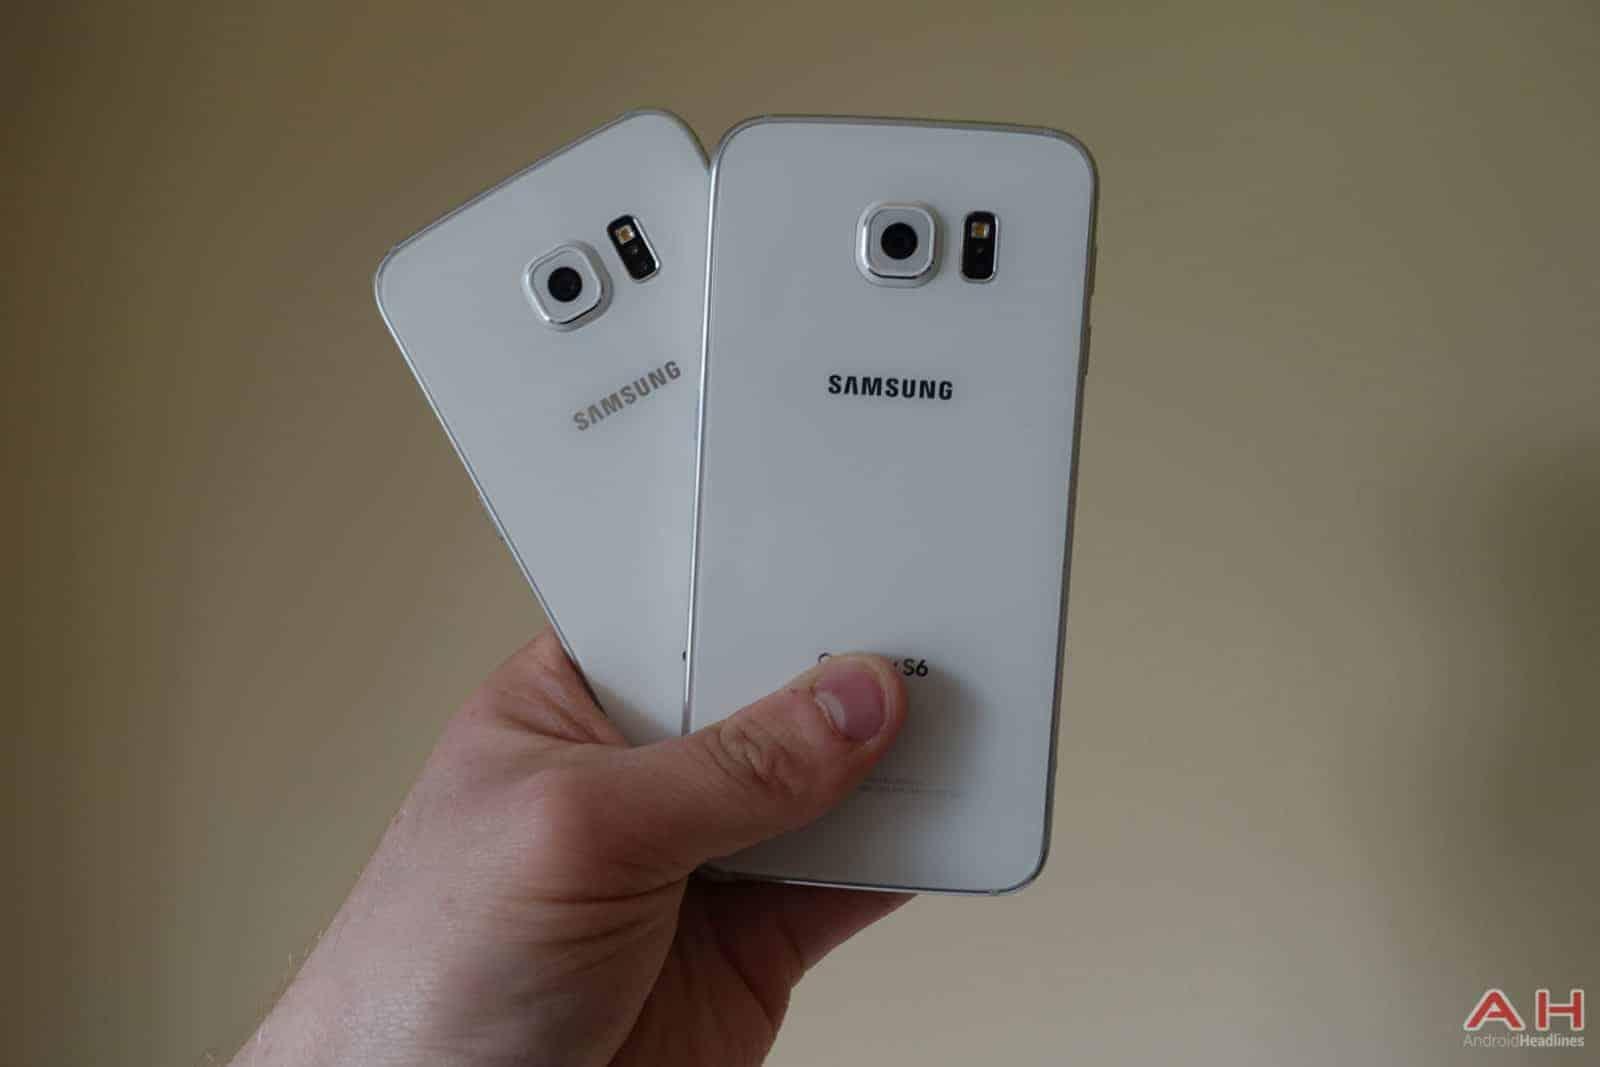 Galaxy-S6-Galaxy-S6-Edge-AH-8